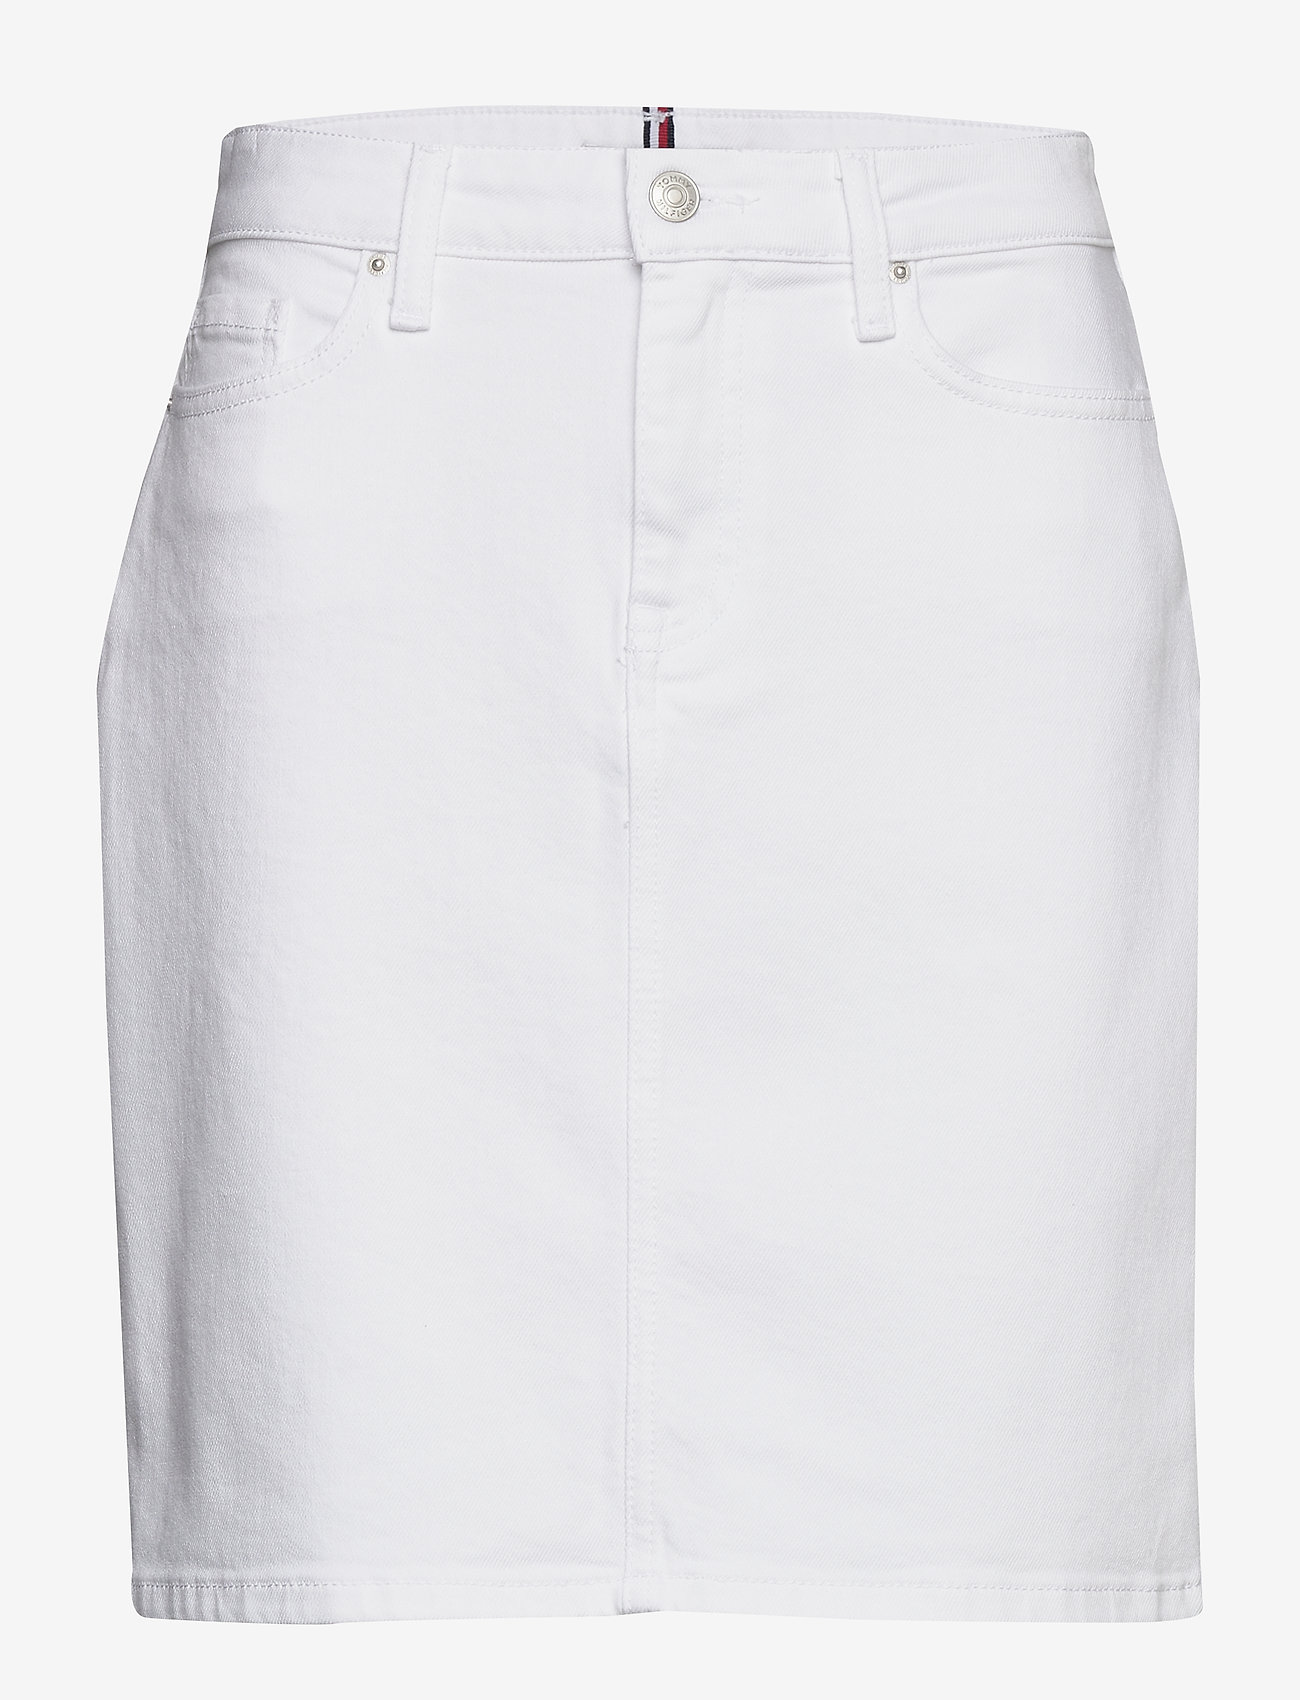 Tommy Hilfiger - ROME STRAIGHT HW SKI - jupes en jeans - white - 0